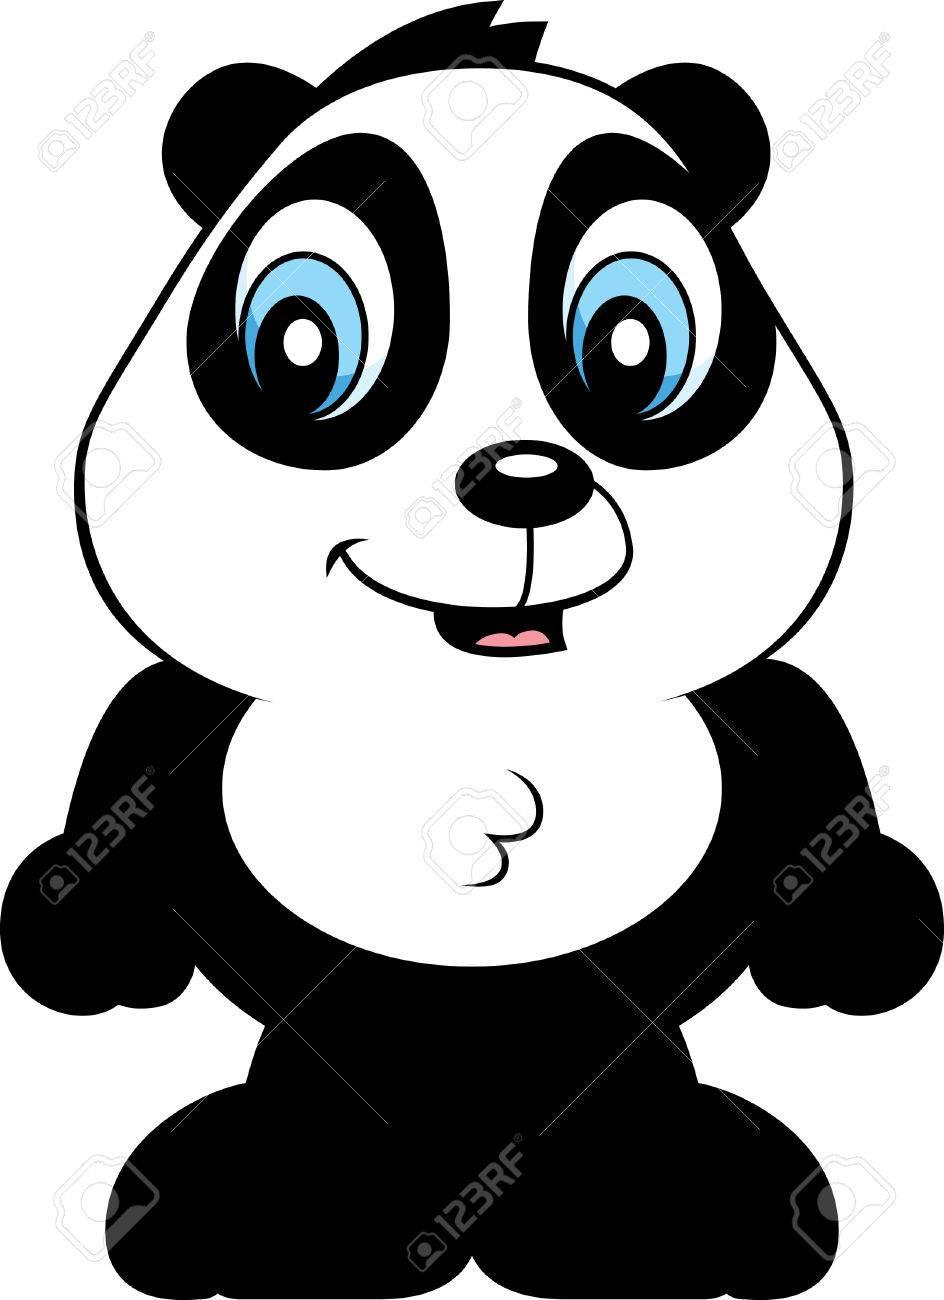 944x1300 A Cartoon Baby Panda Bear Cub Smiling And Happy. Royalty Free